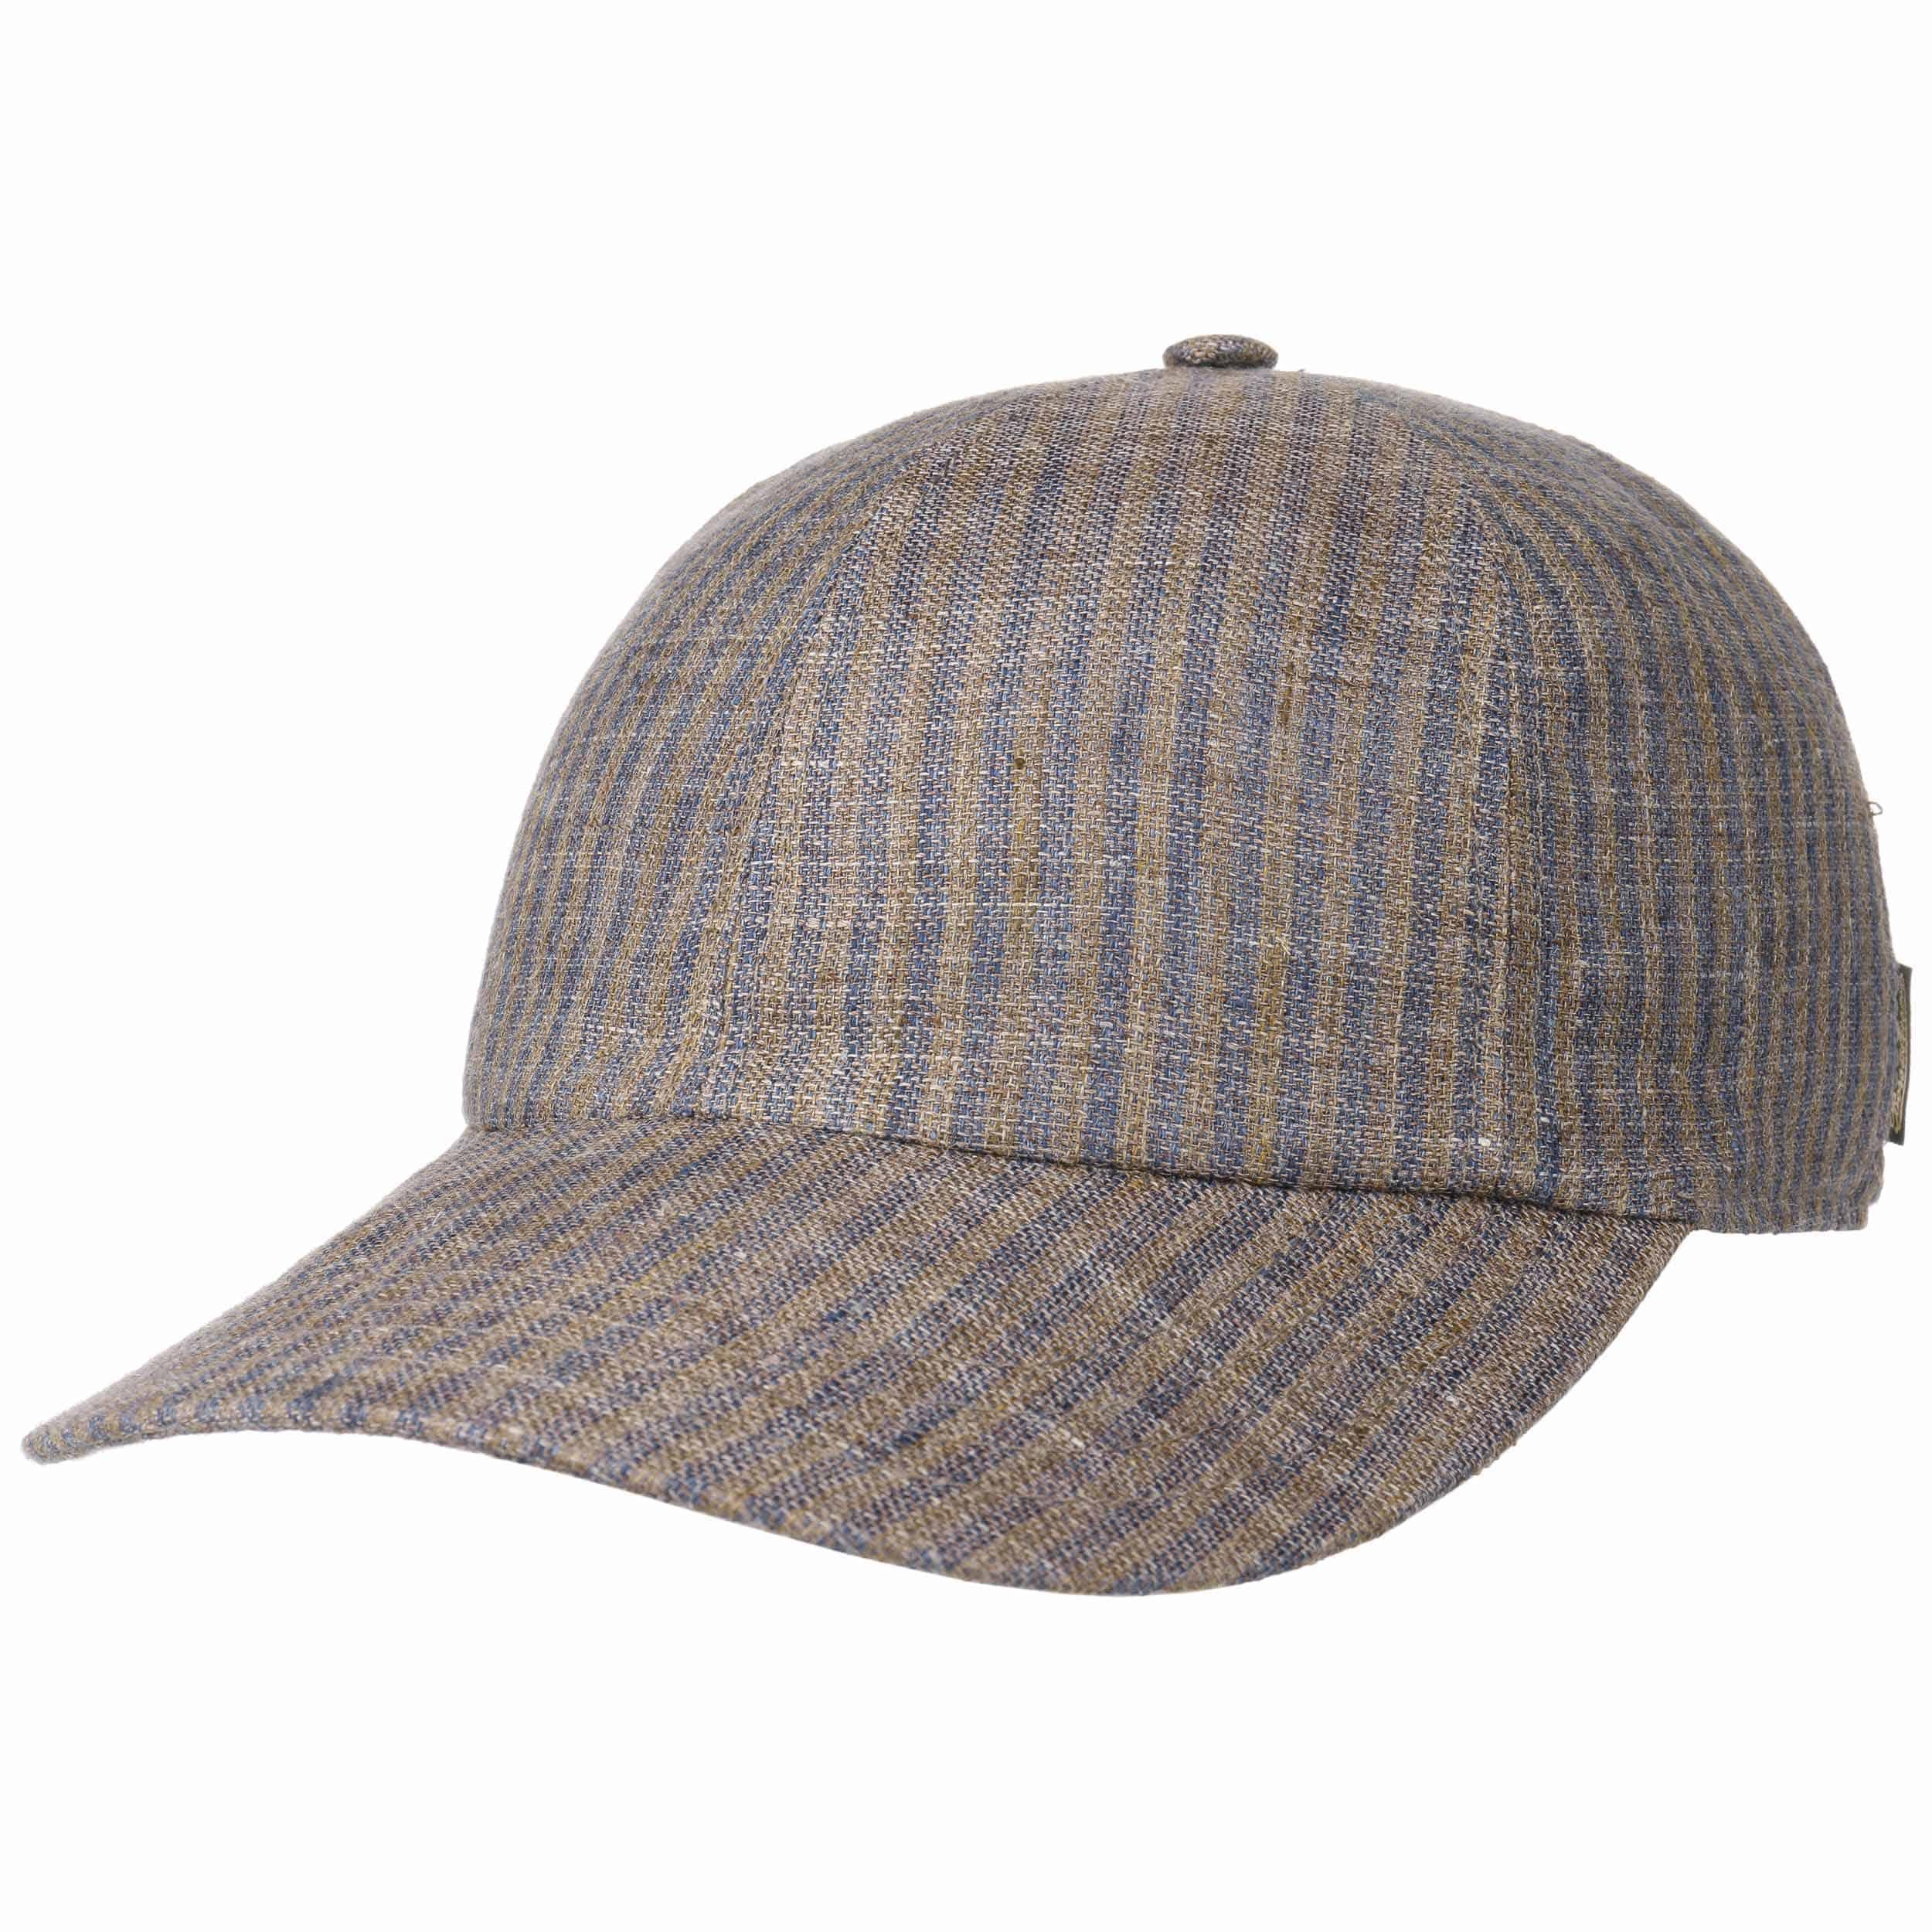 65307ad929c04 ... Pinstripe Baseball Cap by Borsalino - brown 5